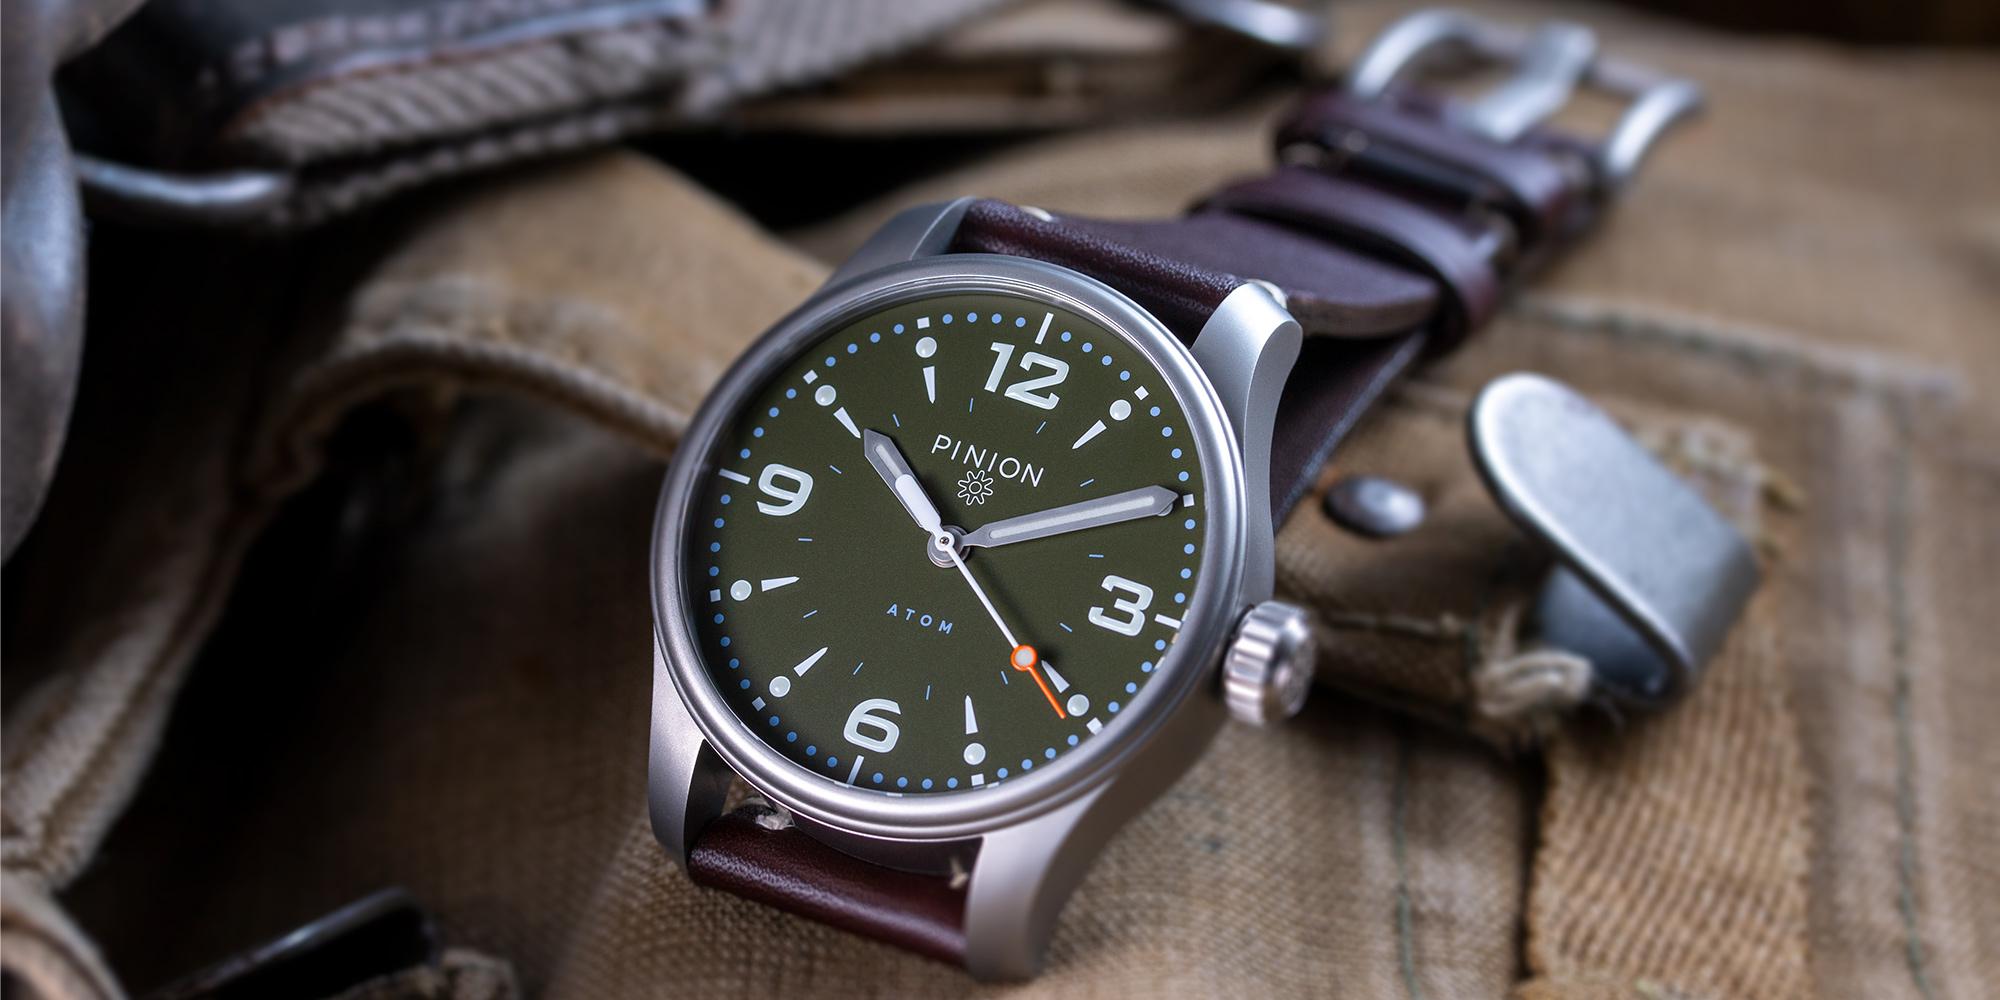 Pinion-Atom-39-no-date-watch-hunter-green-002-a